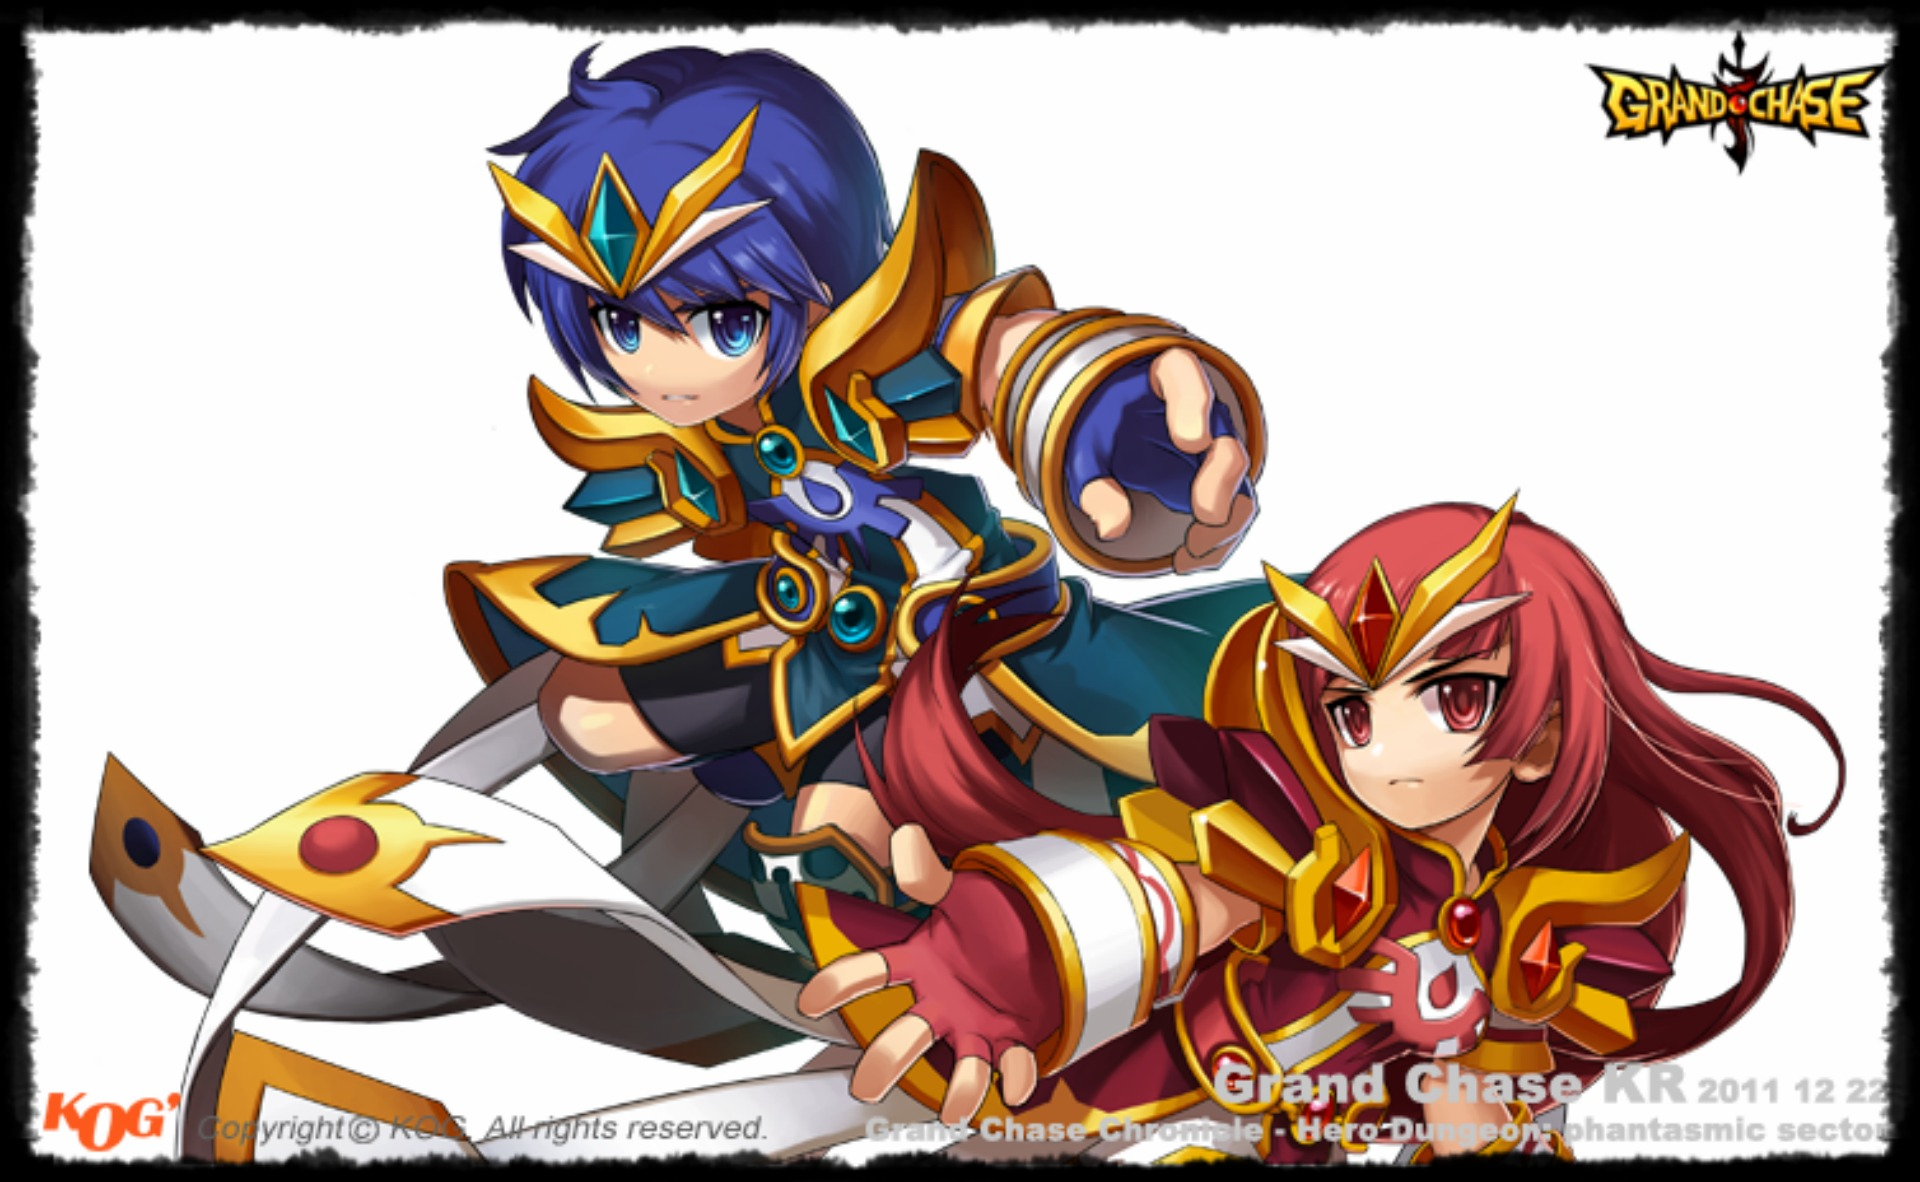 Grand Chase Wallpaper #1118009 - Zerochan Anime Image Board